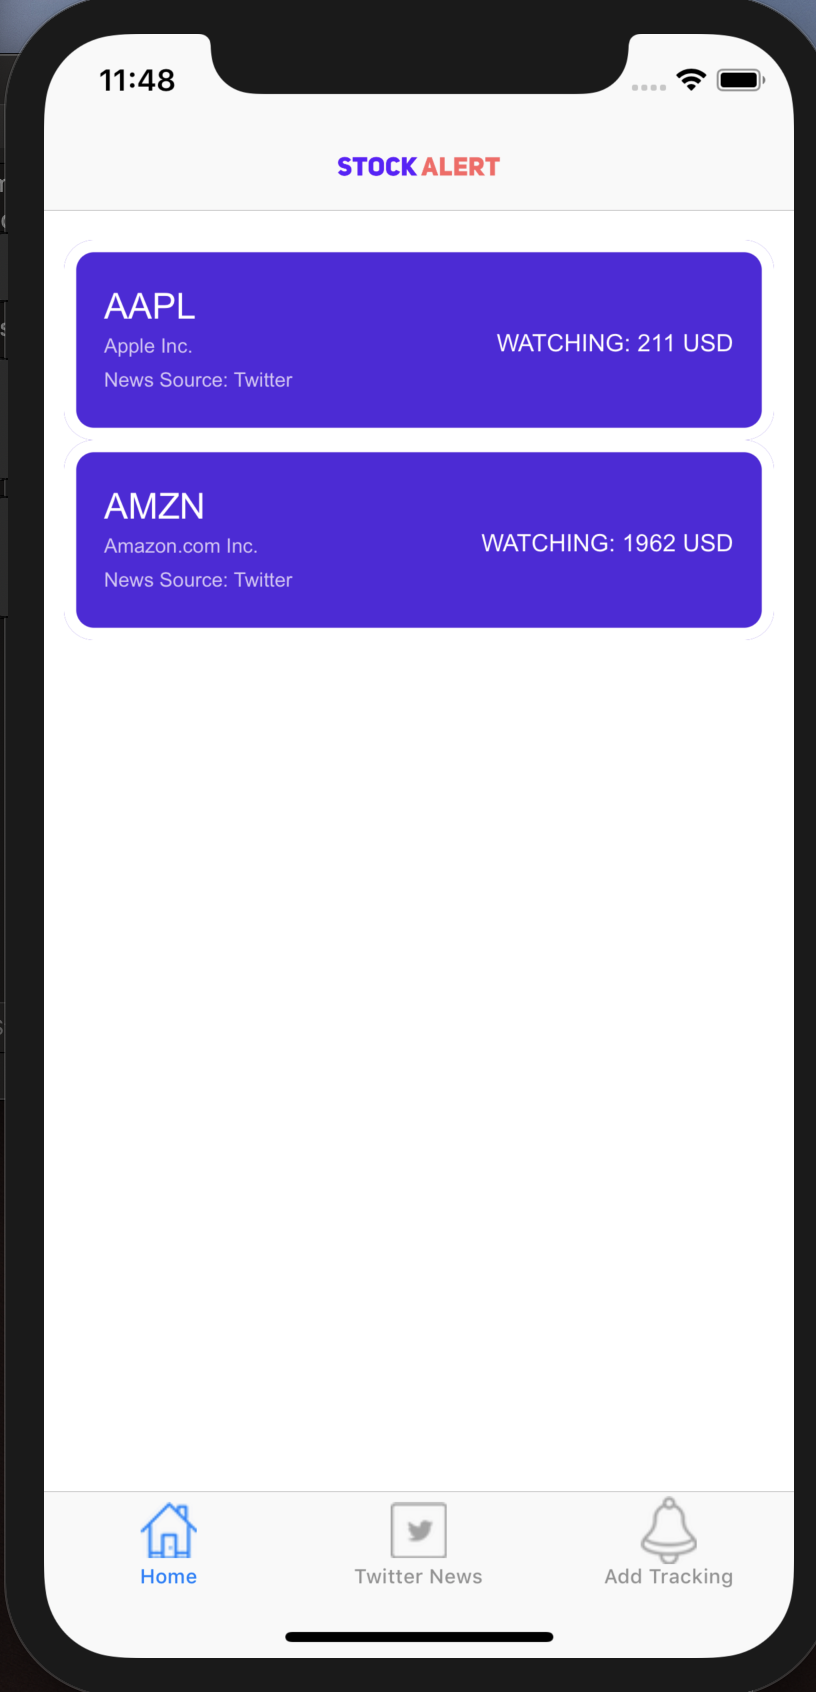 User homepage